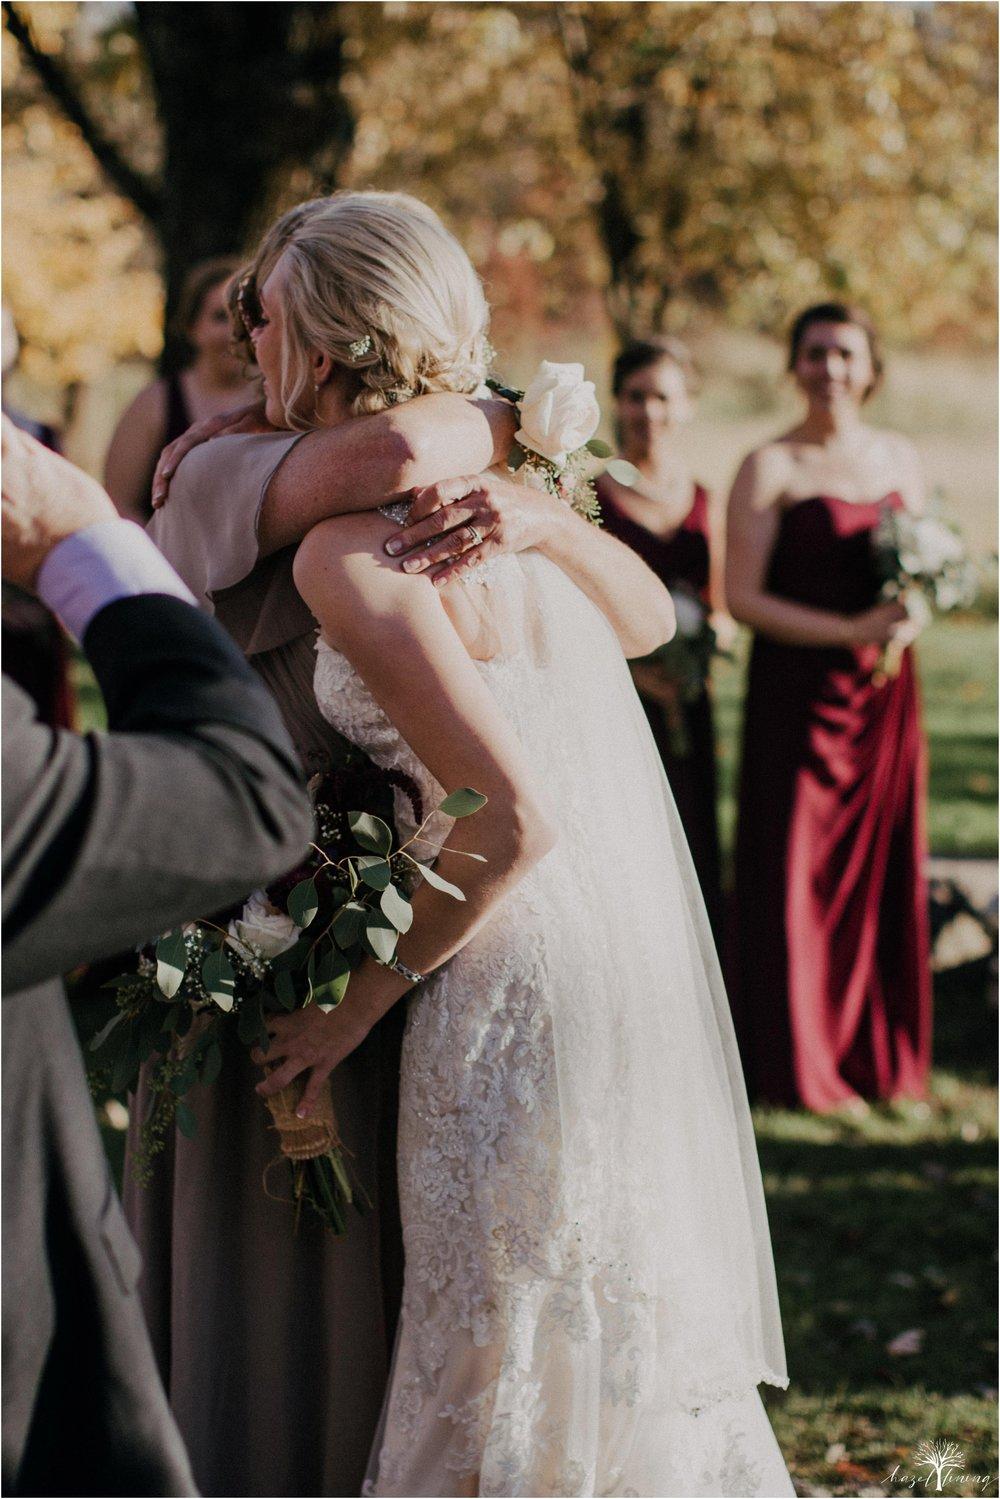 briana-krans-greg-johnston-farm-bakery-and-events-fall-wedding_0090.jpg